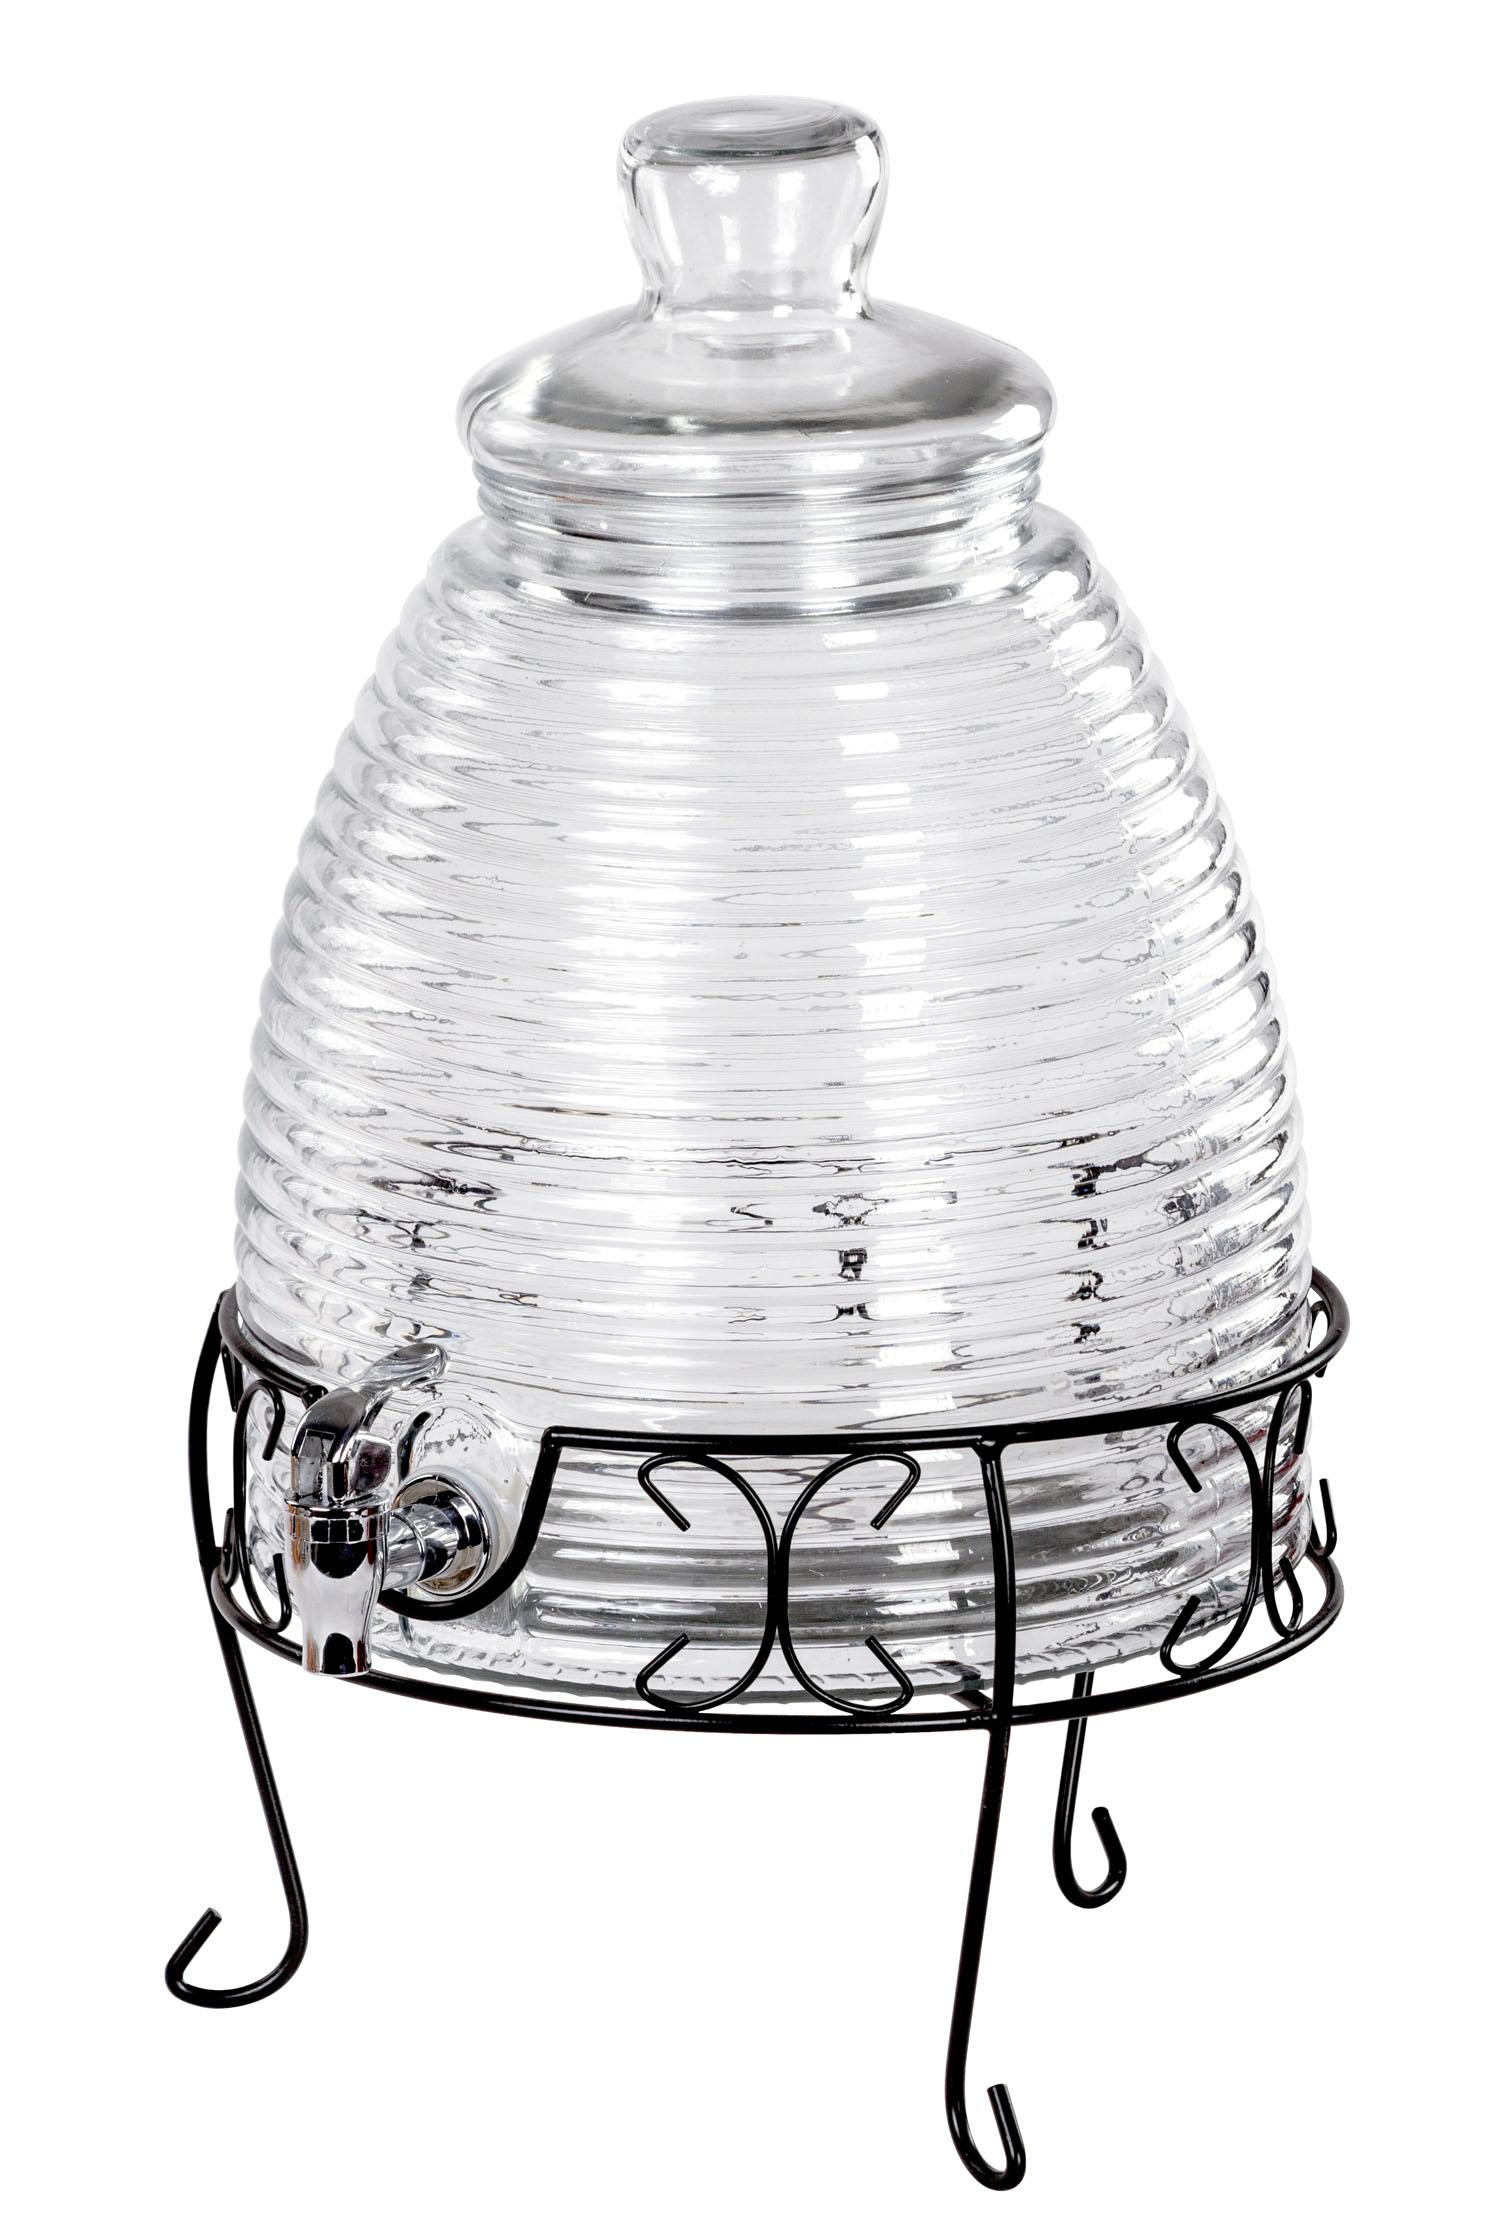 beehive glass beverage dispenser with stand 2 4 gallon drink dispenser ebay. Black Bedroom Furniture Sets. Home Design Ideas